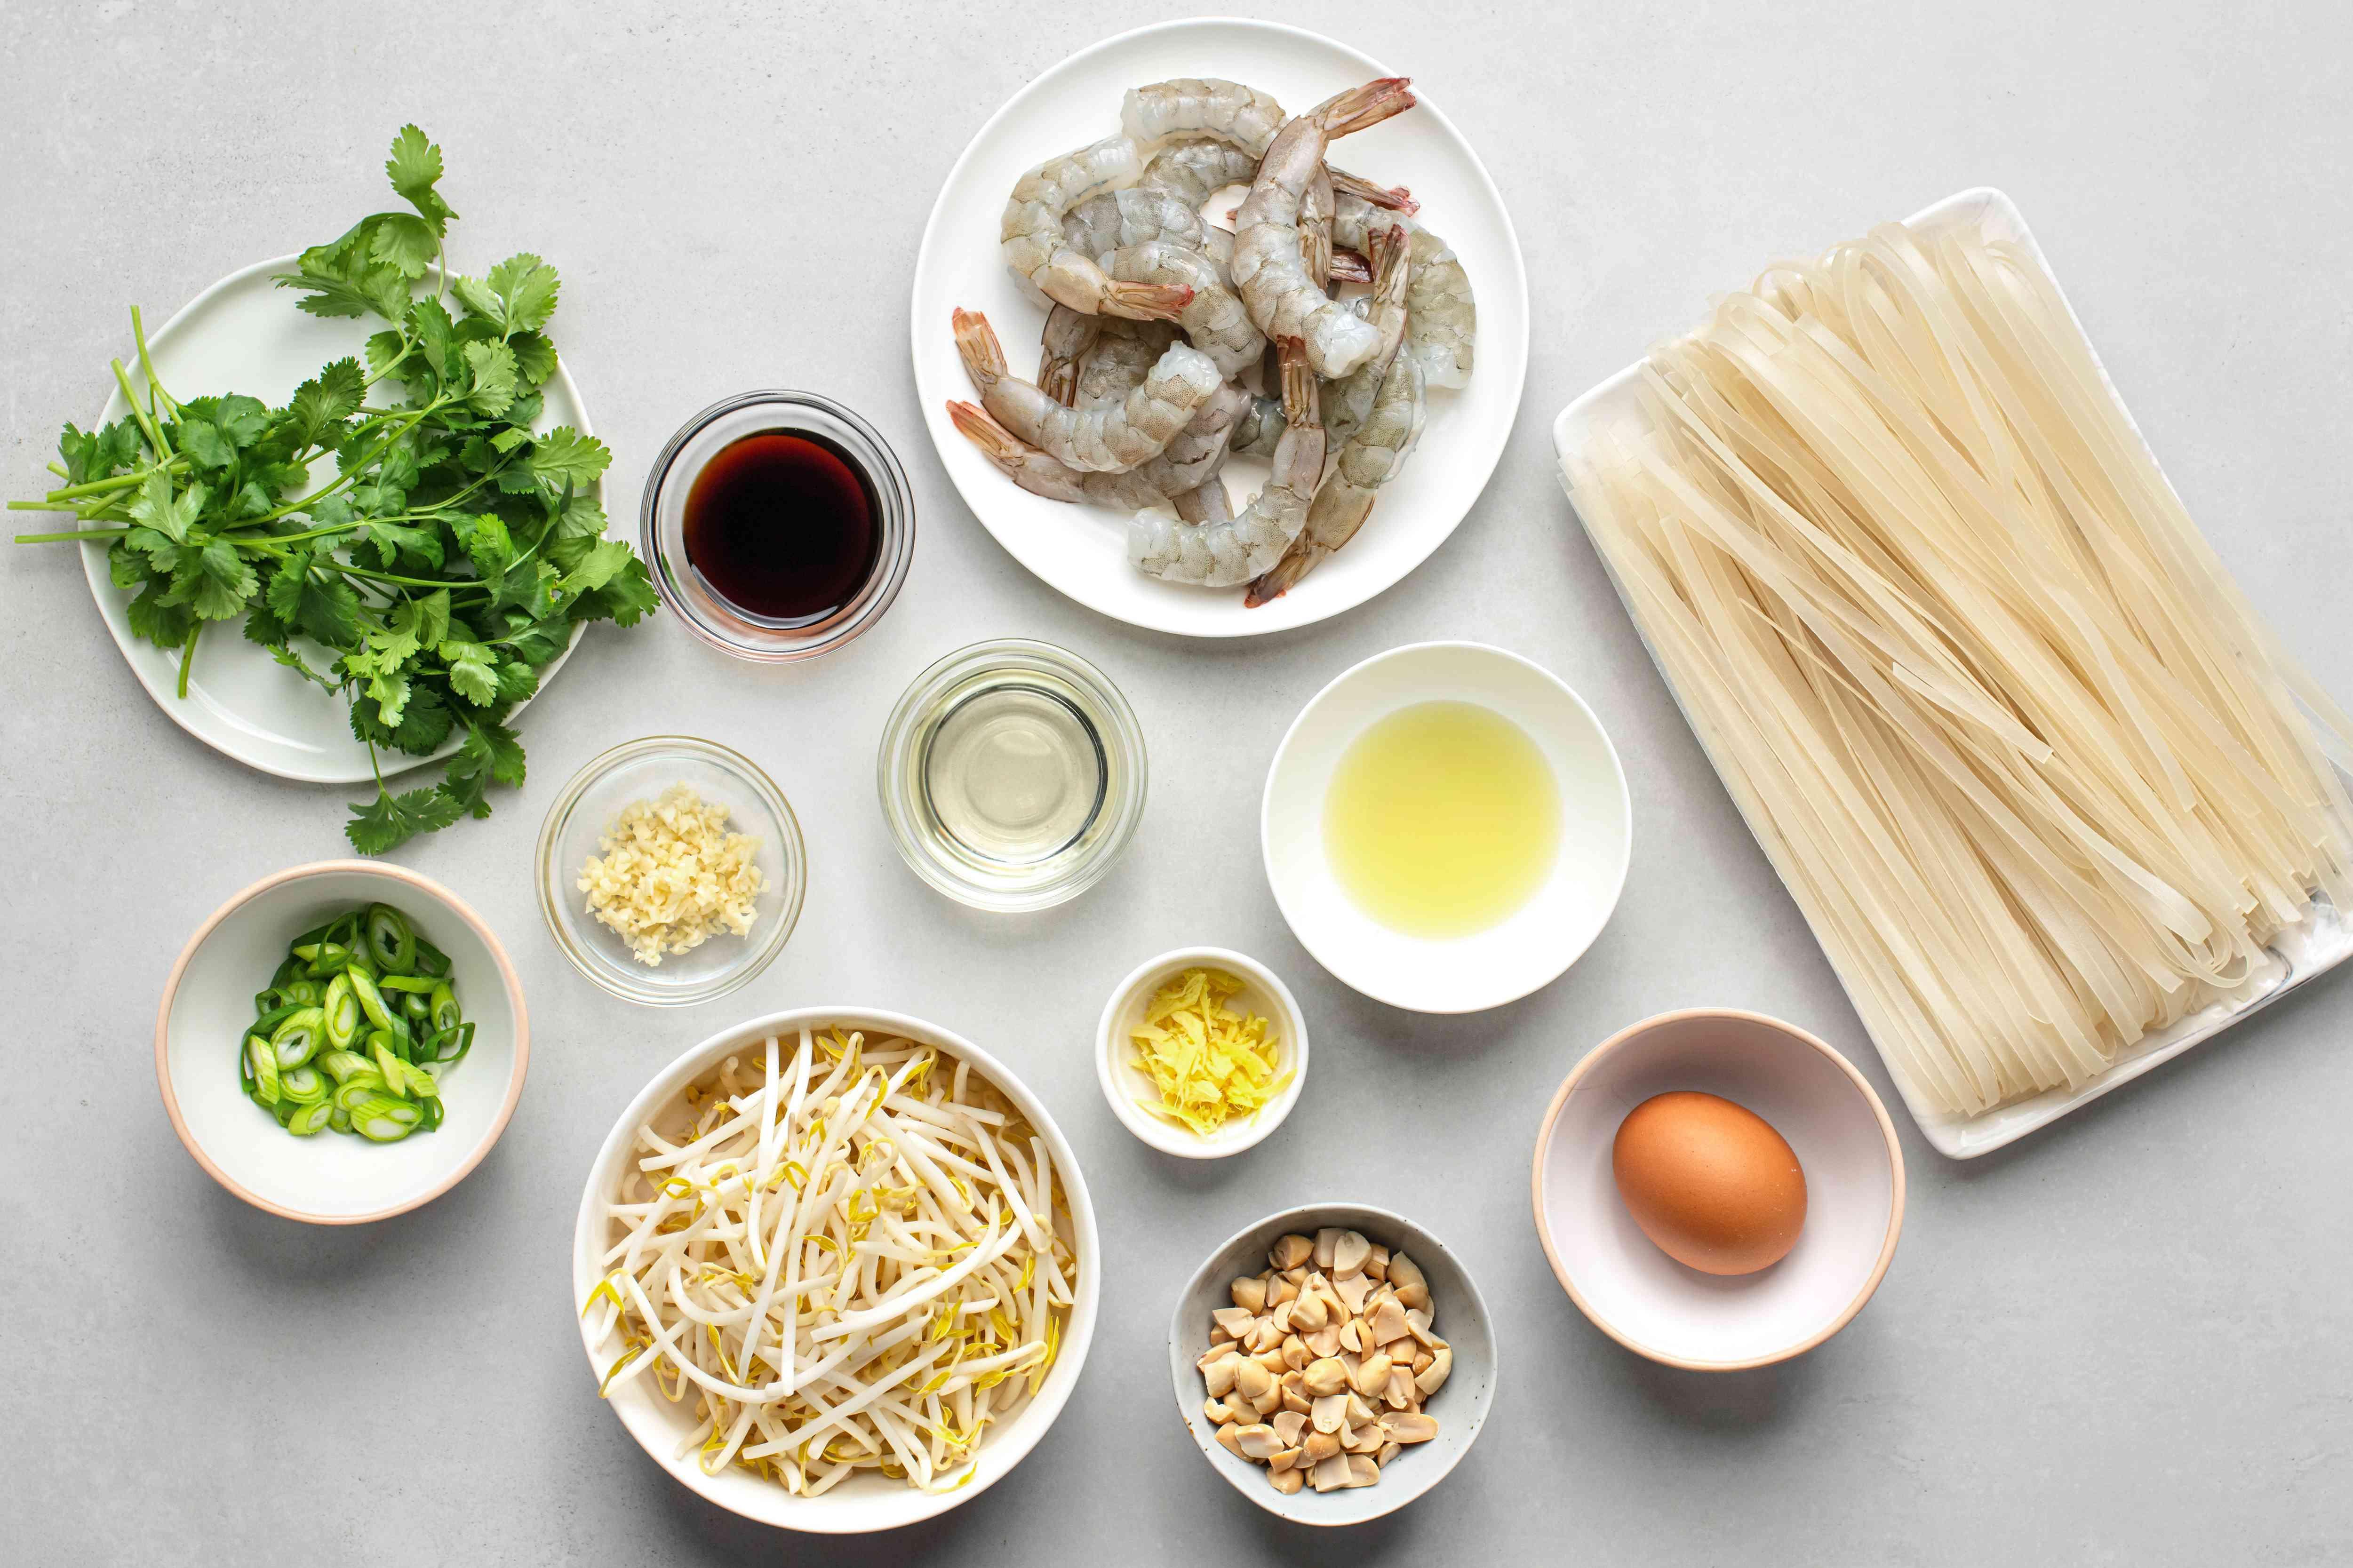 Gluten-Free Shrimp Pad Thai ingredients